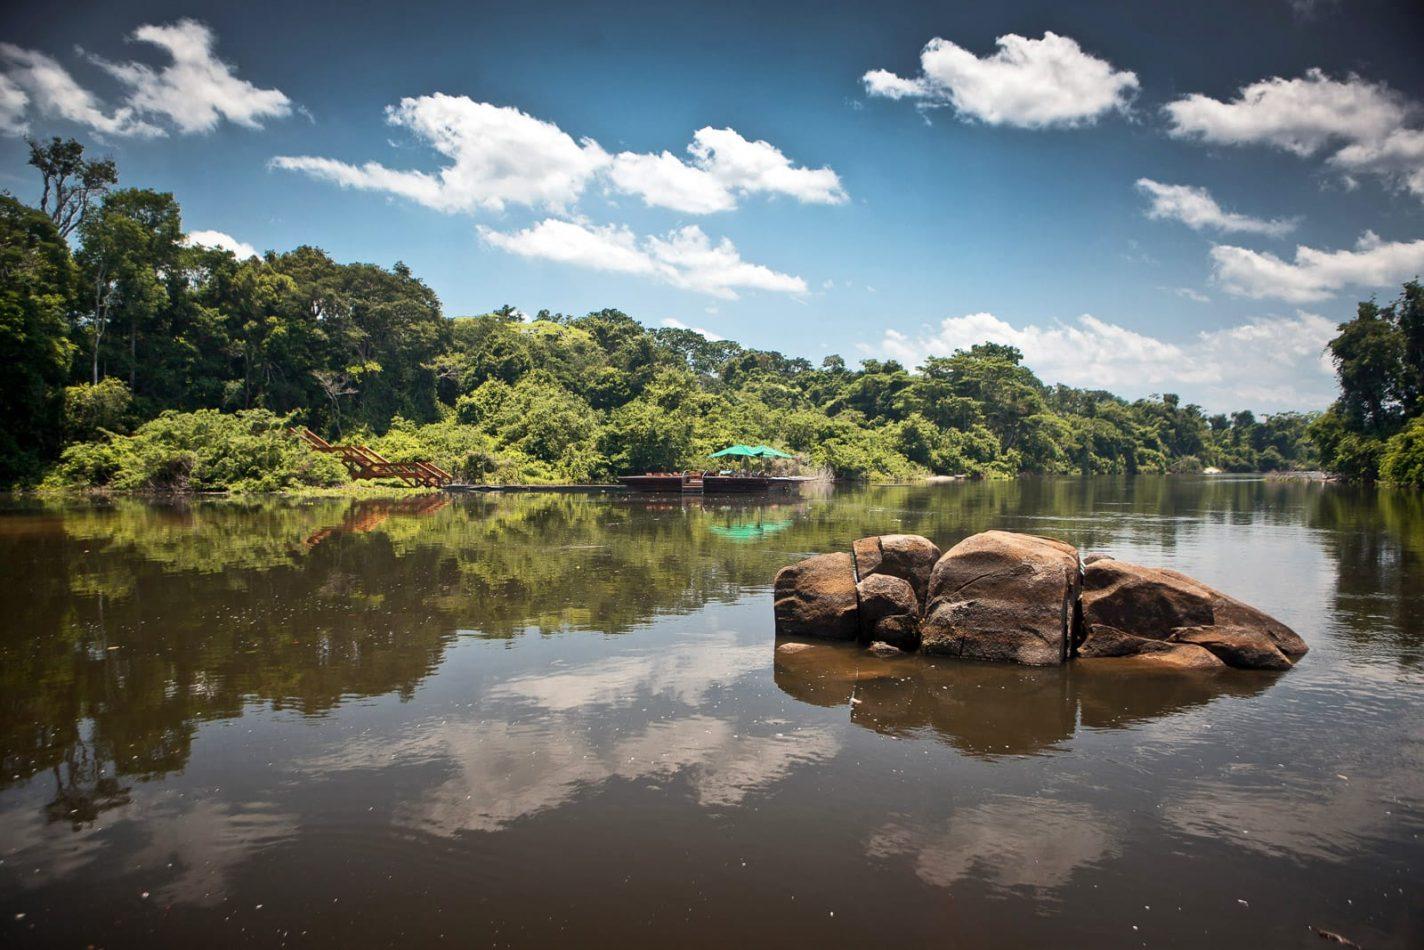 Cristalino Jungle Lodge aan de Cristalino